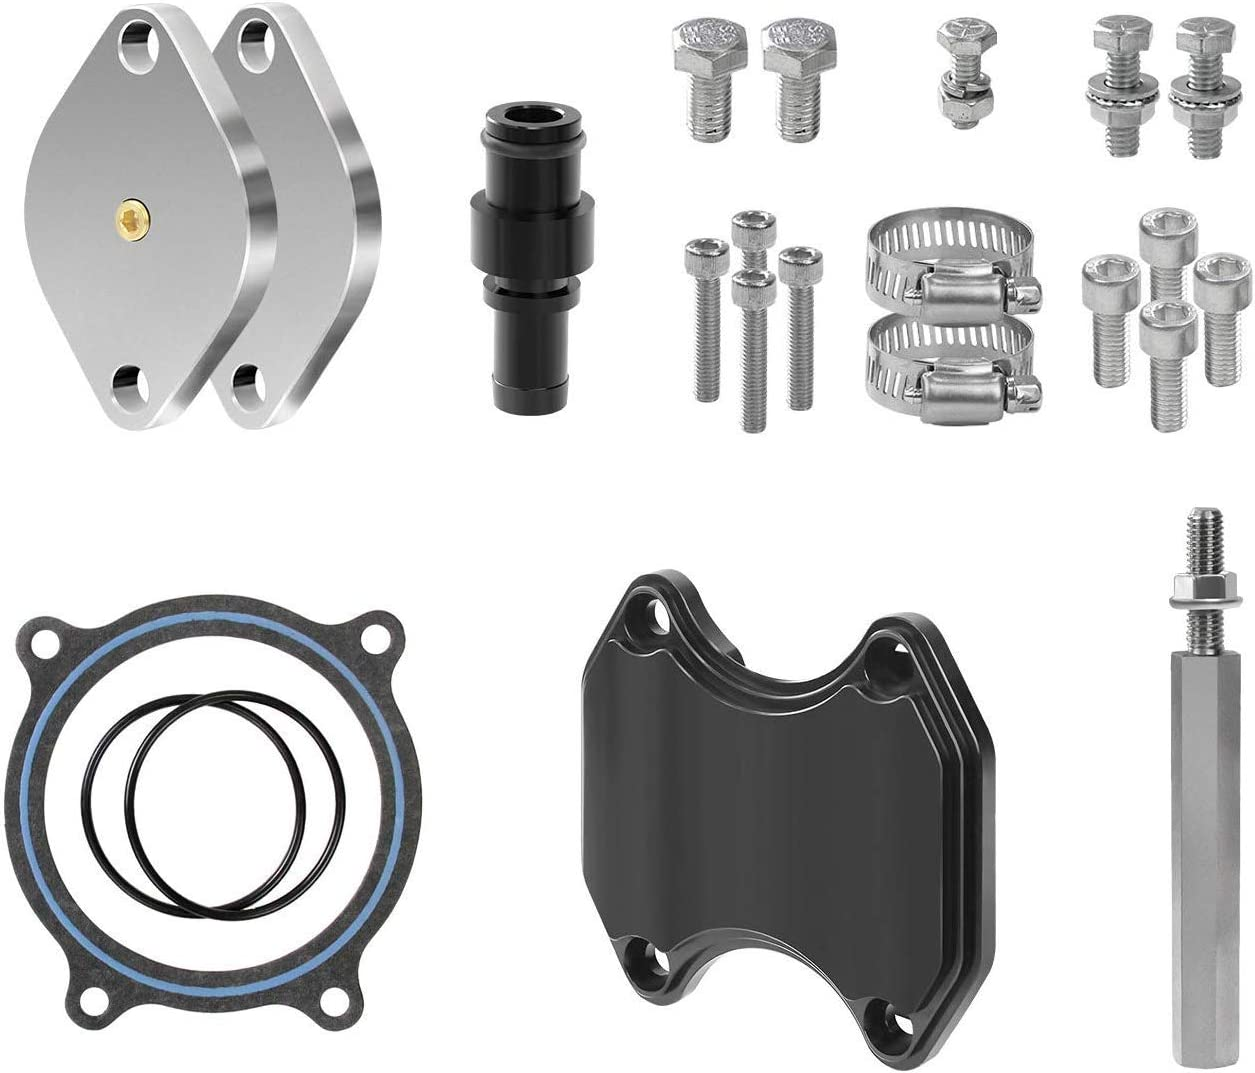 2010-2017 W//TVD MKING Engine Parts MKING EGR Valve and Throttle Valve Kit Dodge Cummins 6.7 6.7L 2010-2017 EGR Valve and Throttle Valve Kit Dodge Cummins 6.7 6.7L 2010-2017